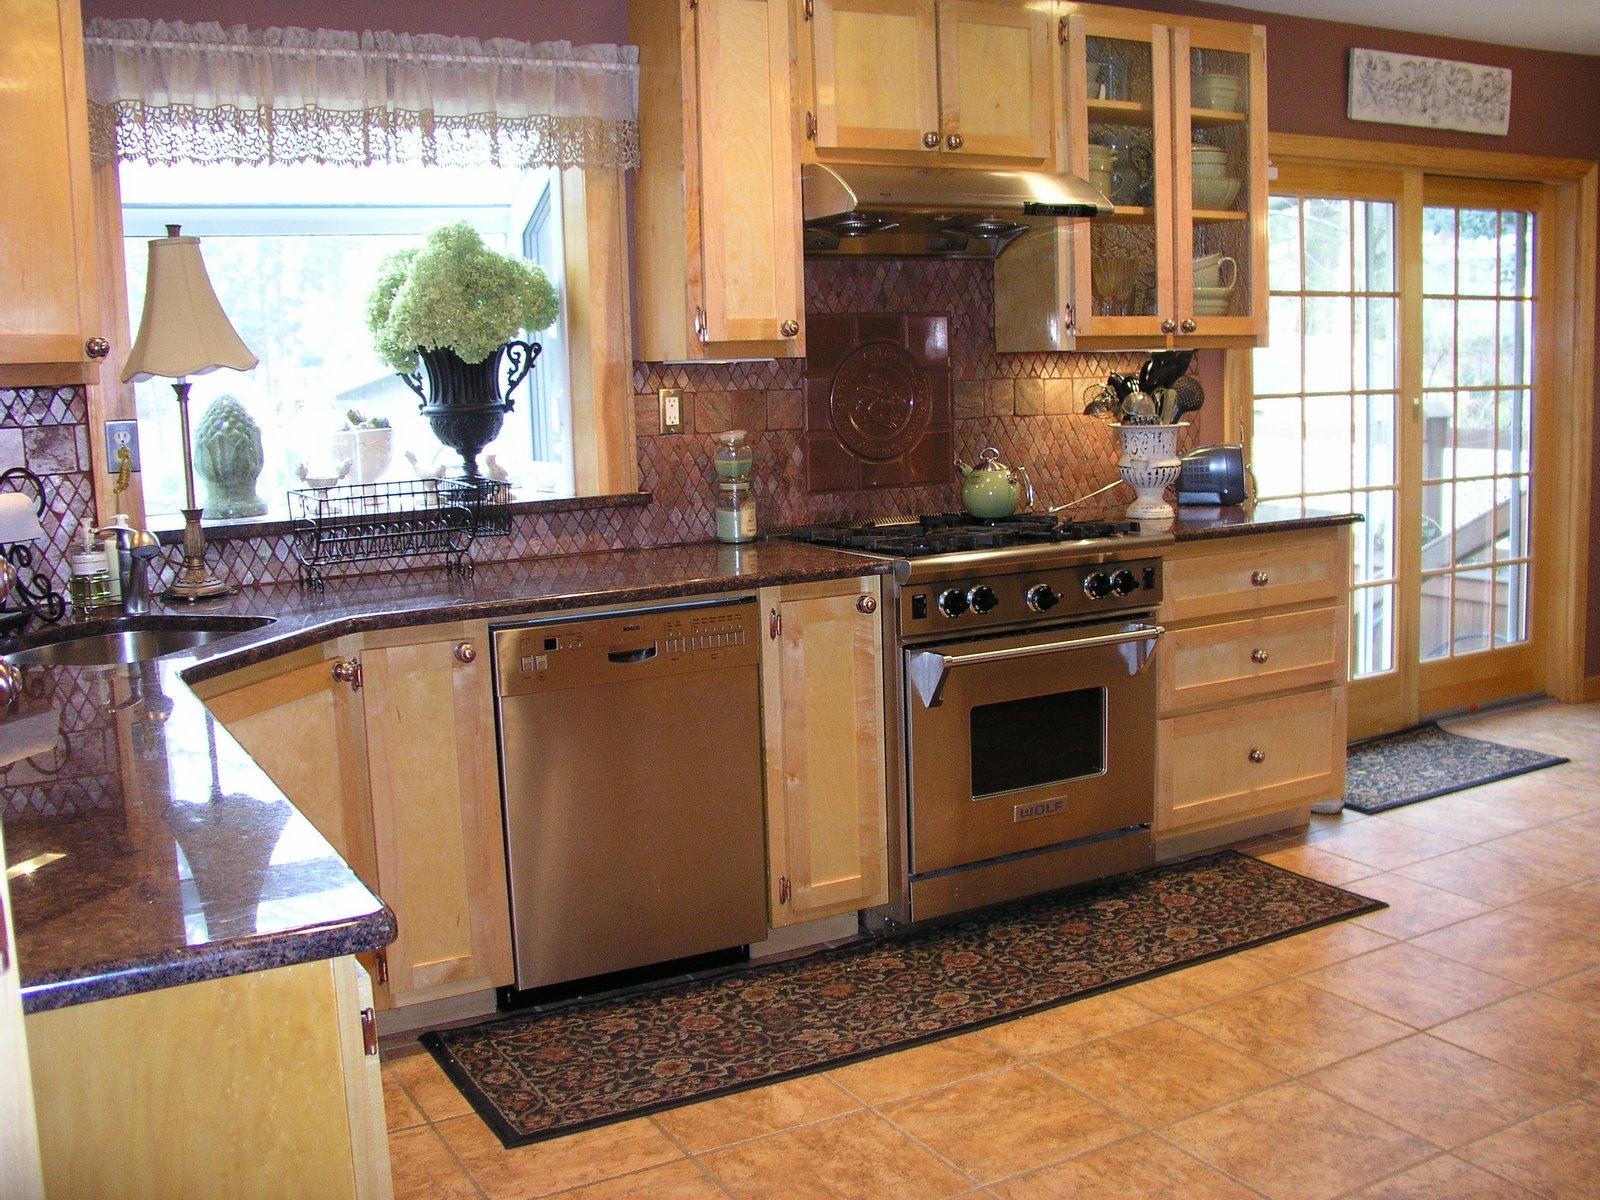 a lapin life french kitchen backsplash kitchen backsplash inspirations french country cottage